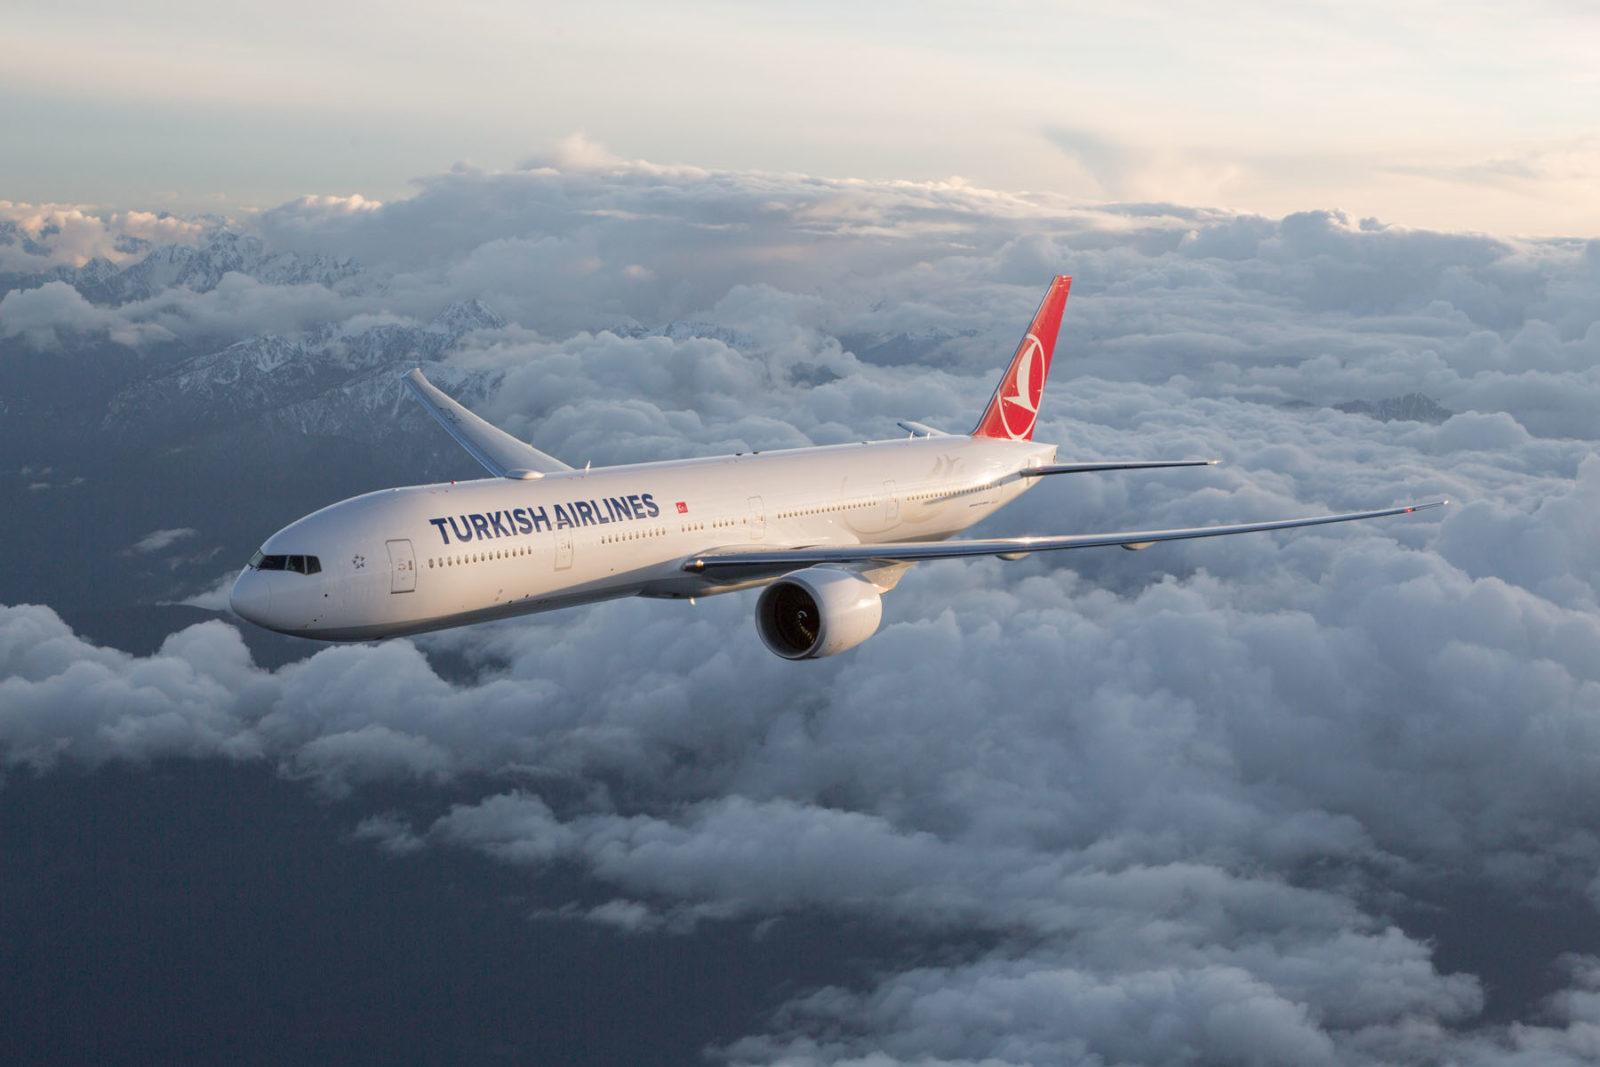 turkish airlines - ავიაკომპანია თურქეთის ავიახაზები - Turkish Airlines